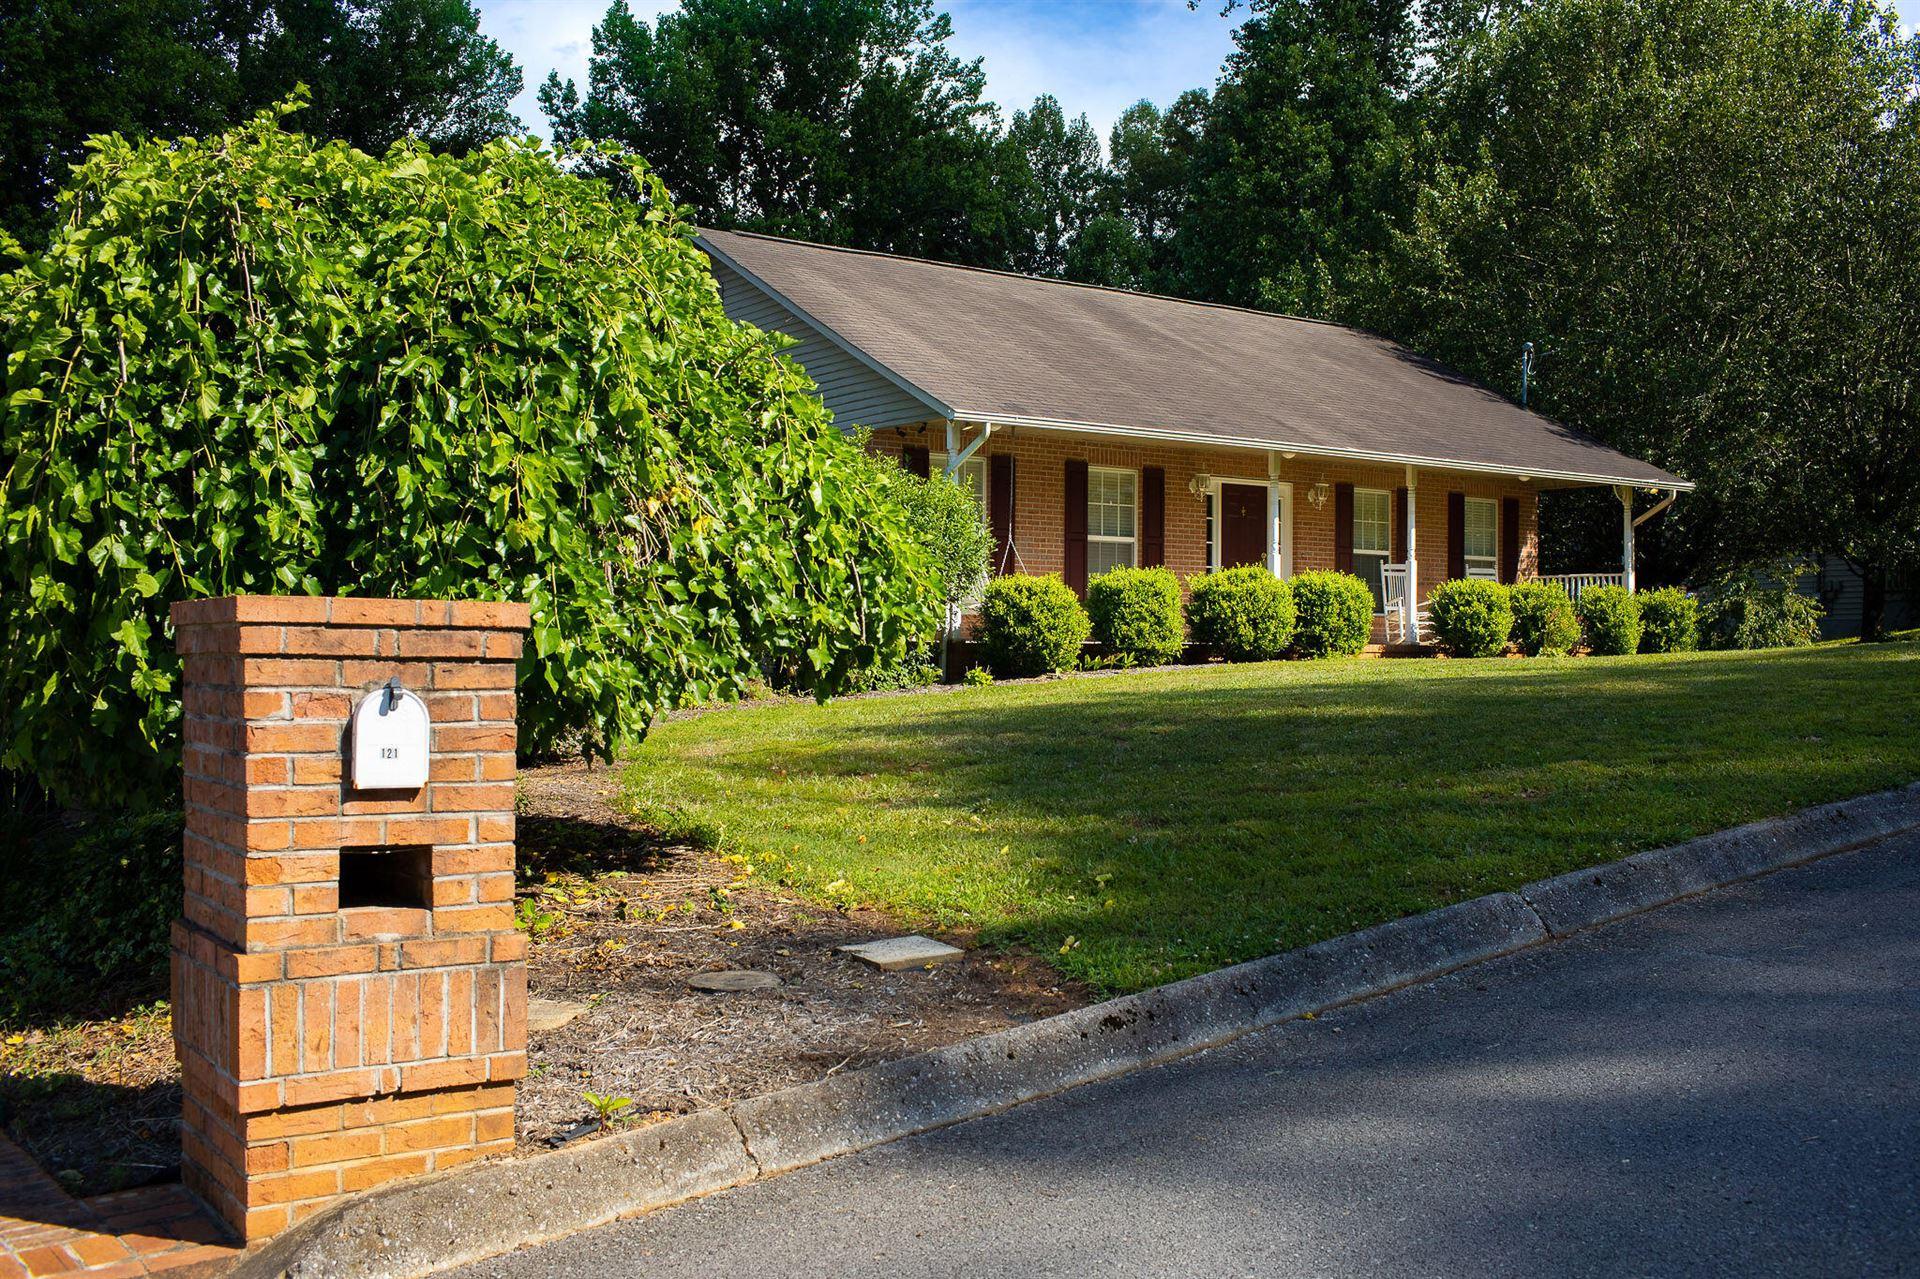 Photo of 121 Overlook Lane Lane, Clinton, TN 37716 (MLS # 1158688)